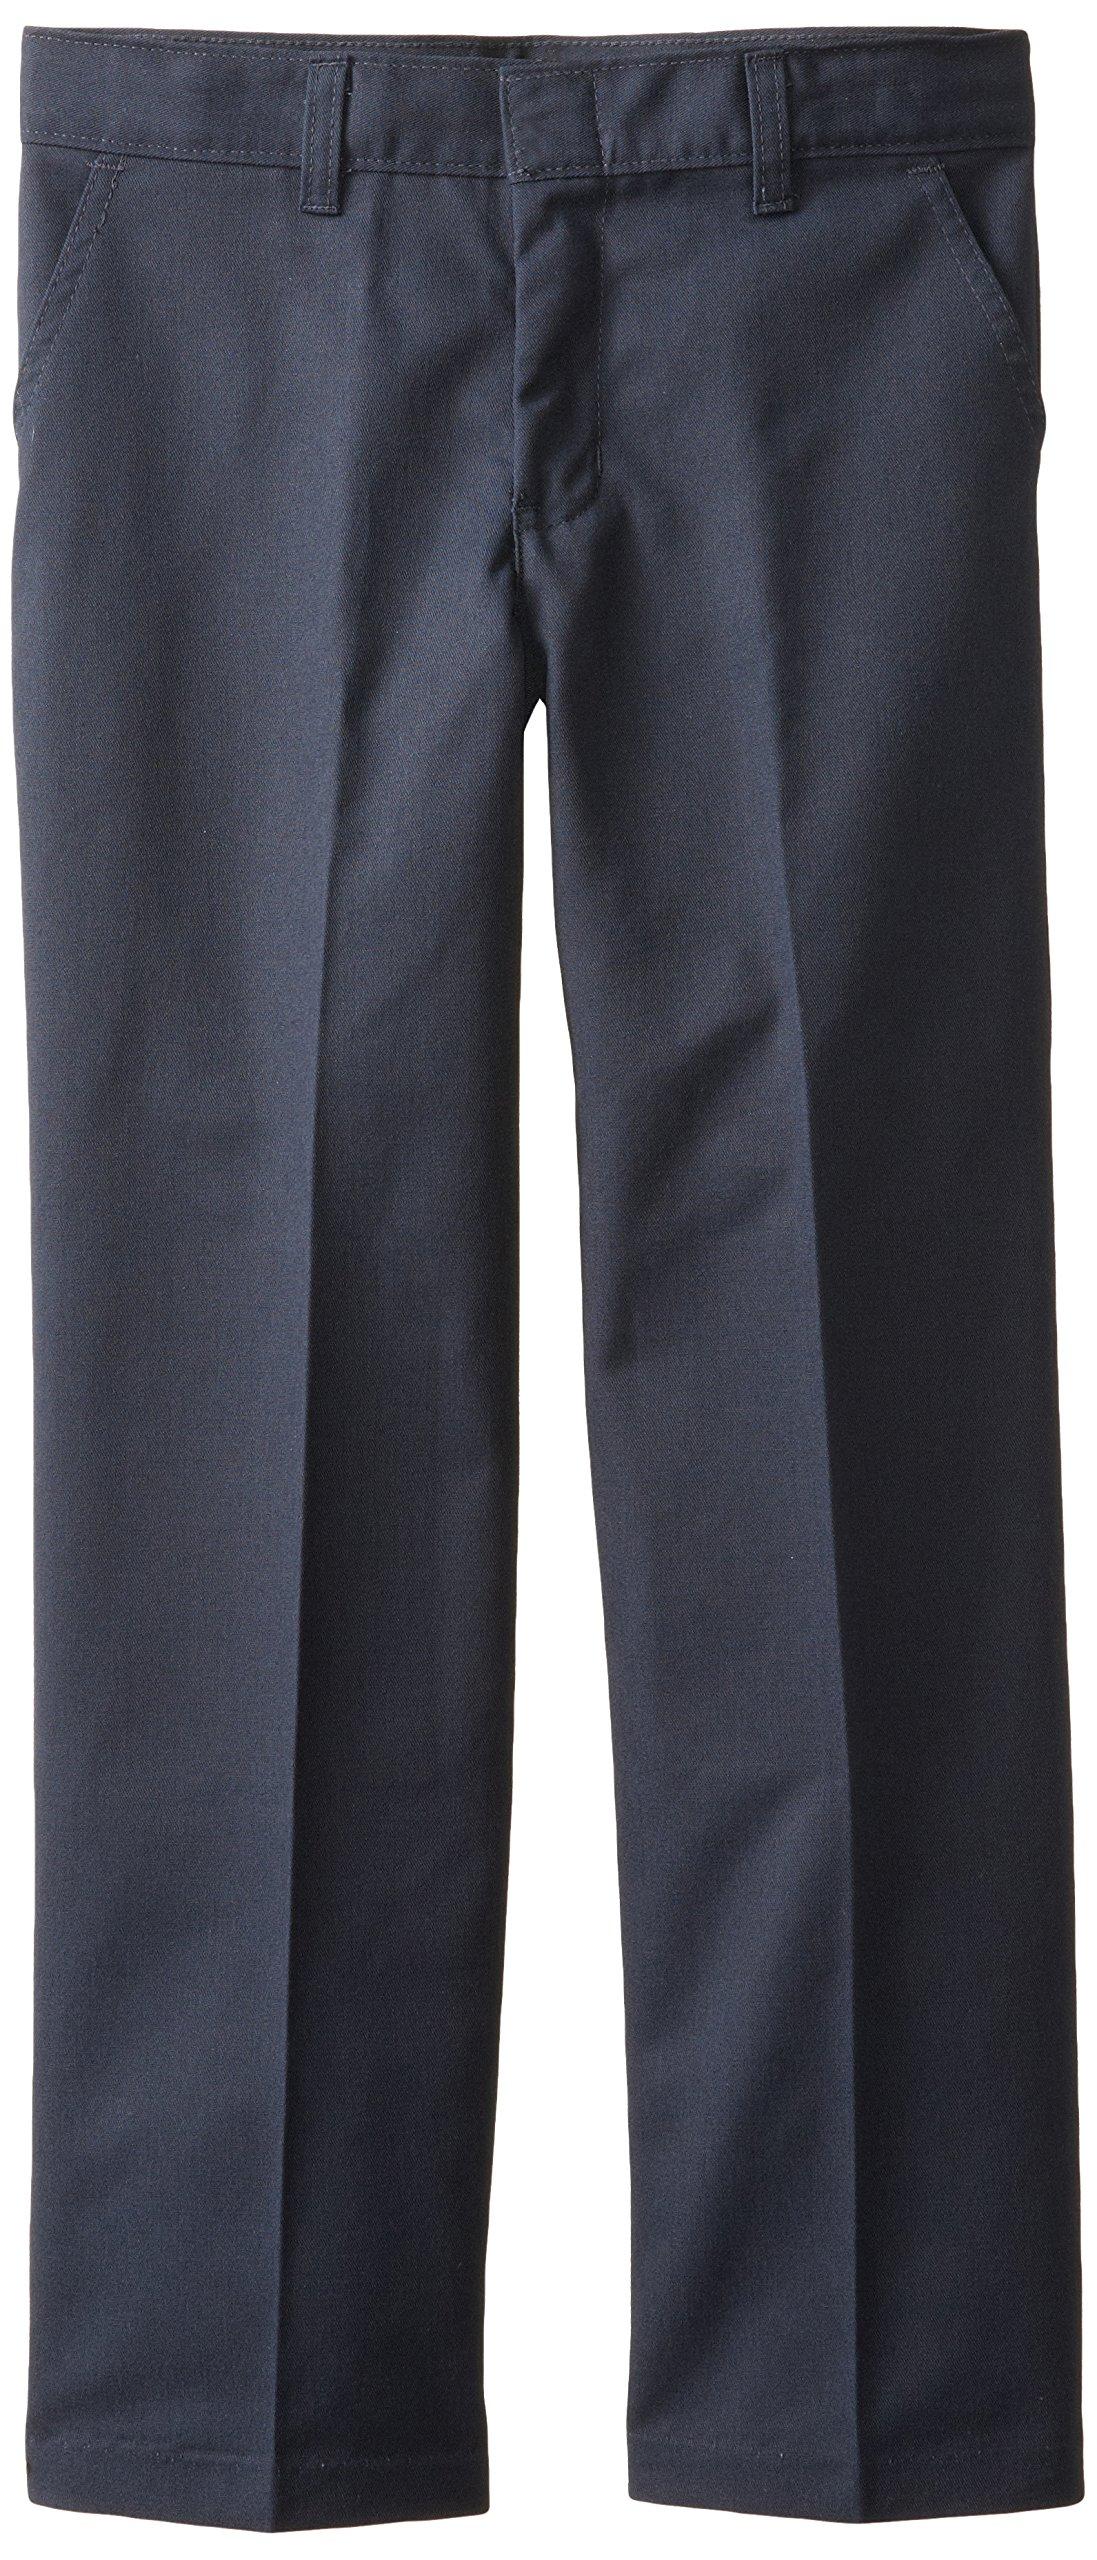 Dickies Big Boys' Flex Waist Flat Front Pant, Dark Navy, 14 Husky